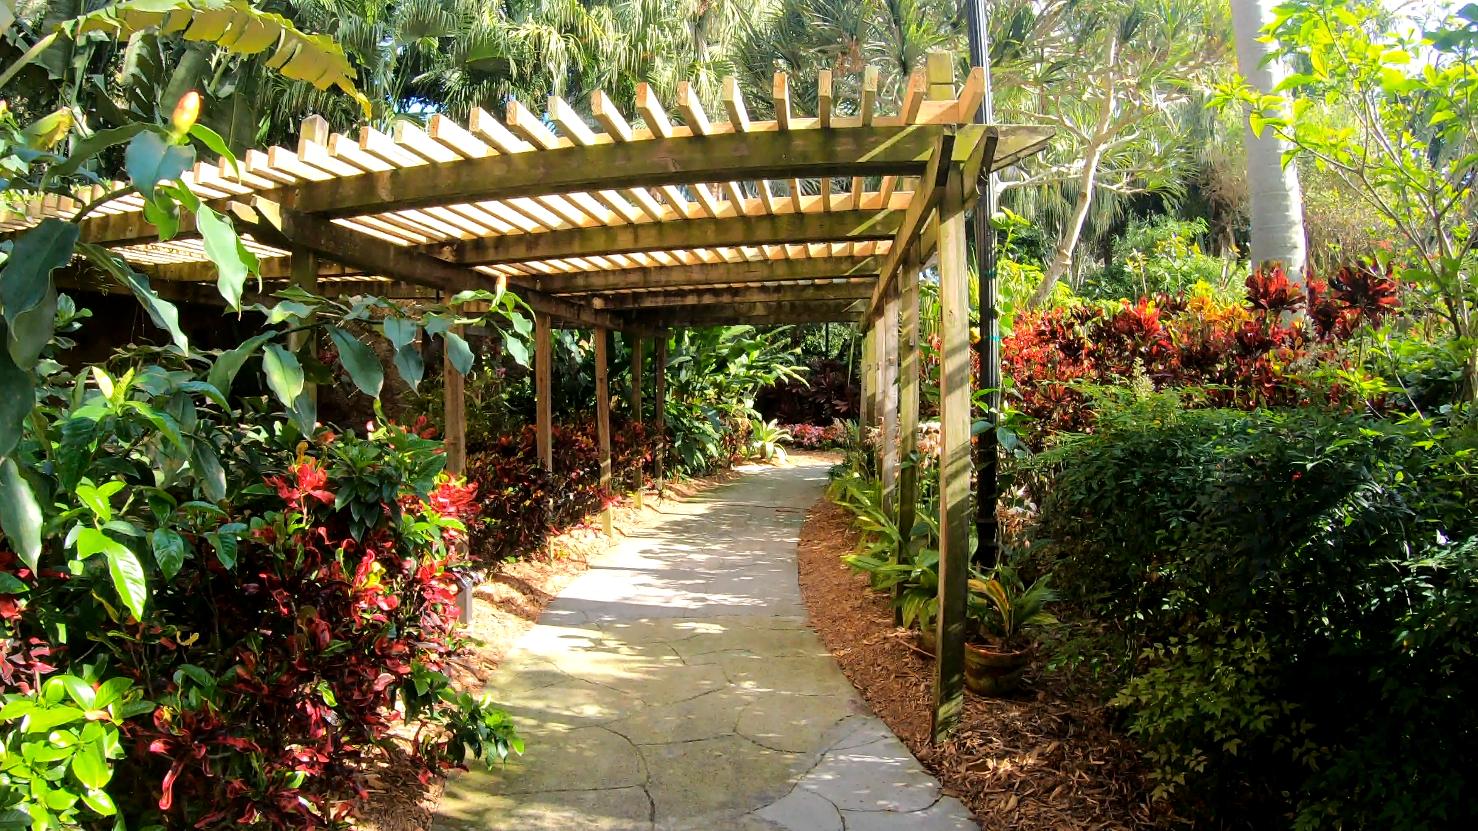 Sunken Gardens is a botanical paradise in St. Petersburg